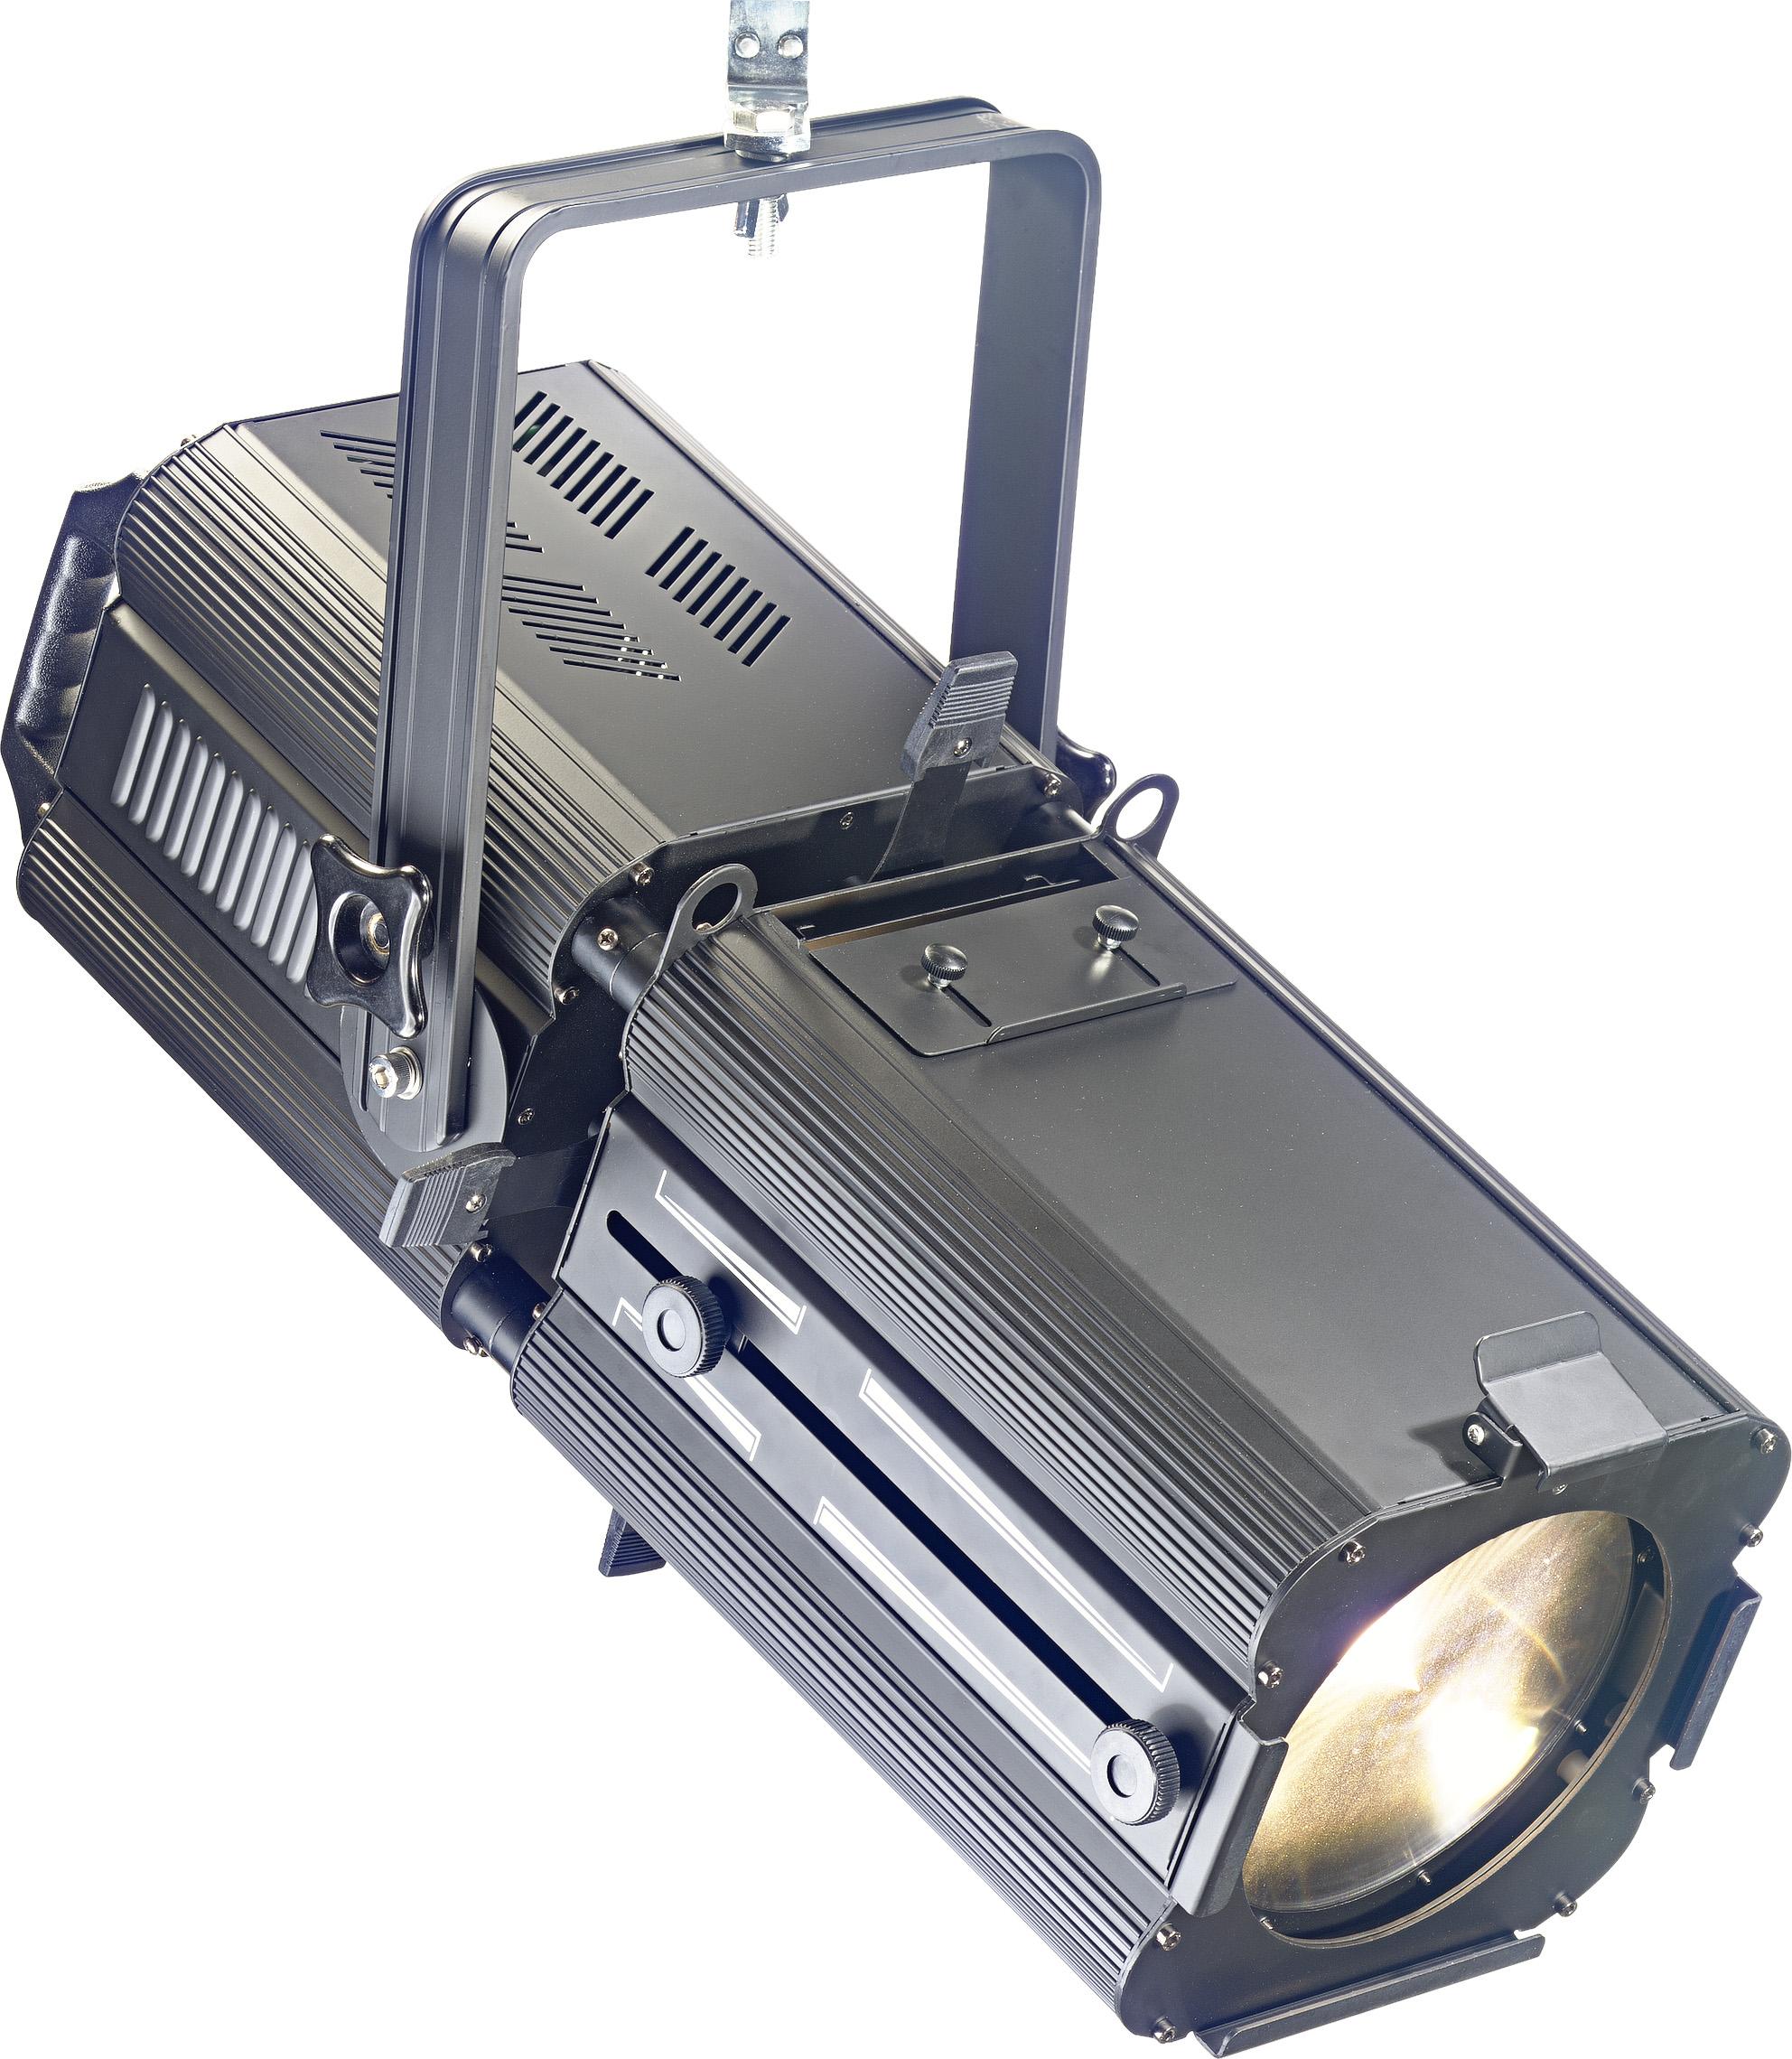 Stagg SLP200Z divadelní reflektor, 1x200W COB 6500K DMX, 17° - 50°